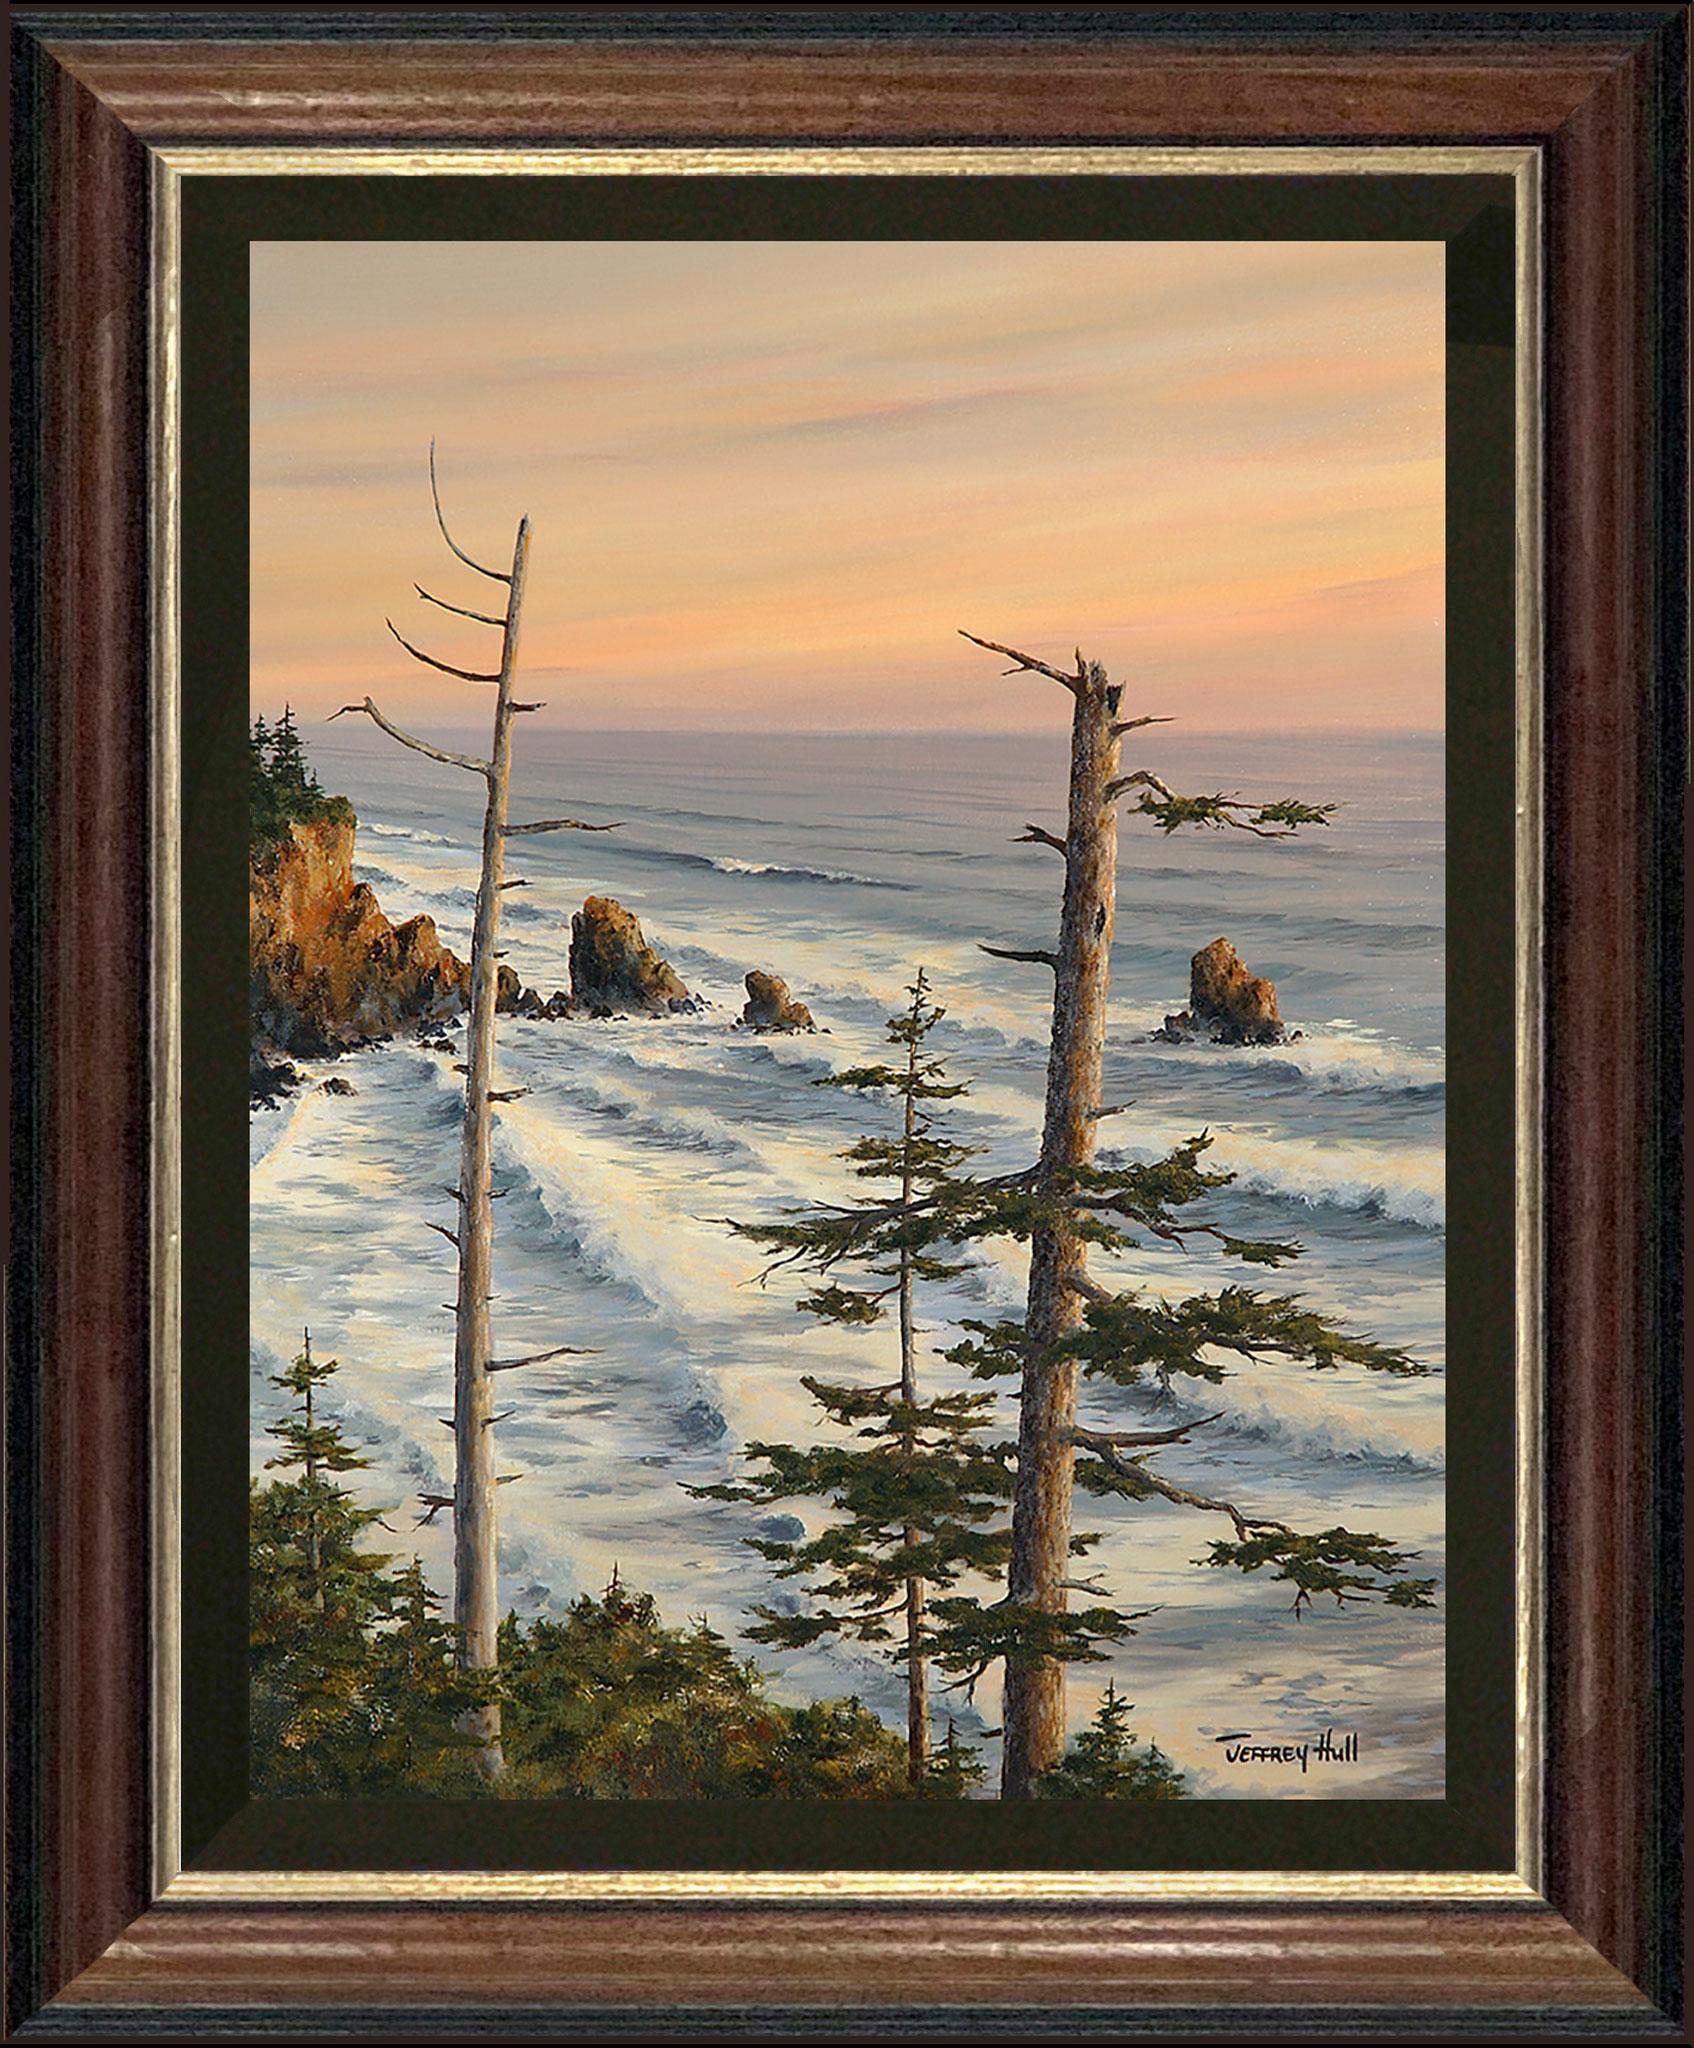 Sunset-Cliffs-OpenEd-Malabar-Black-Liner-4-Website-2021